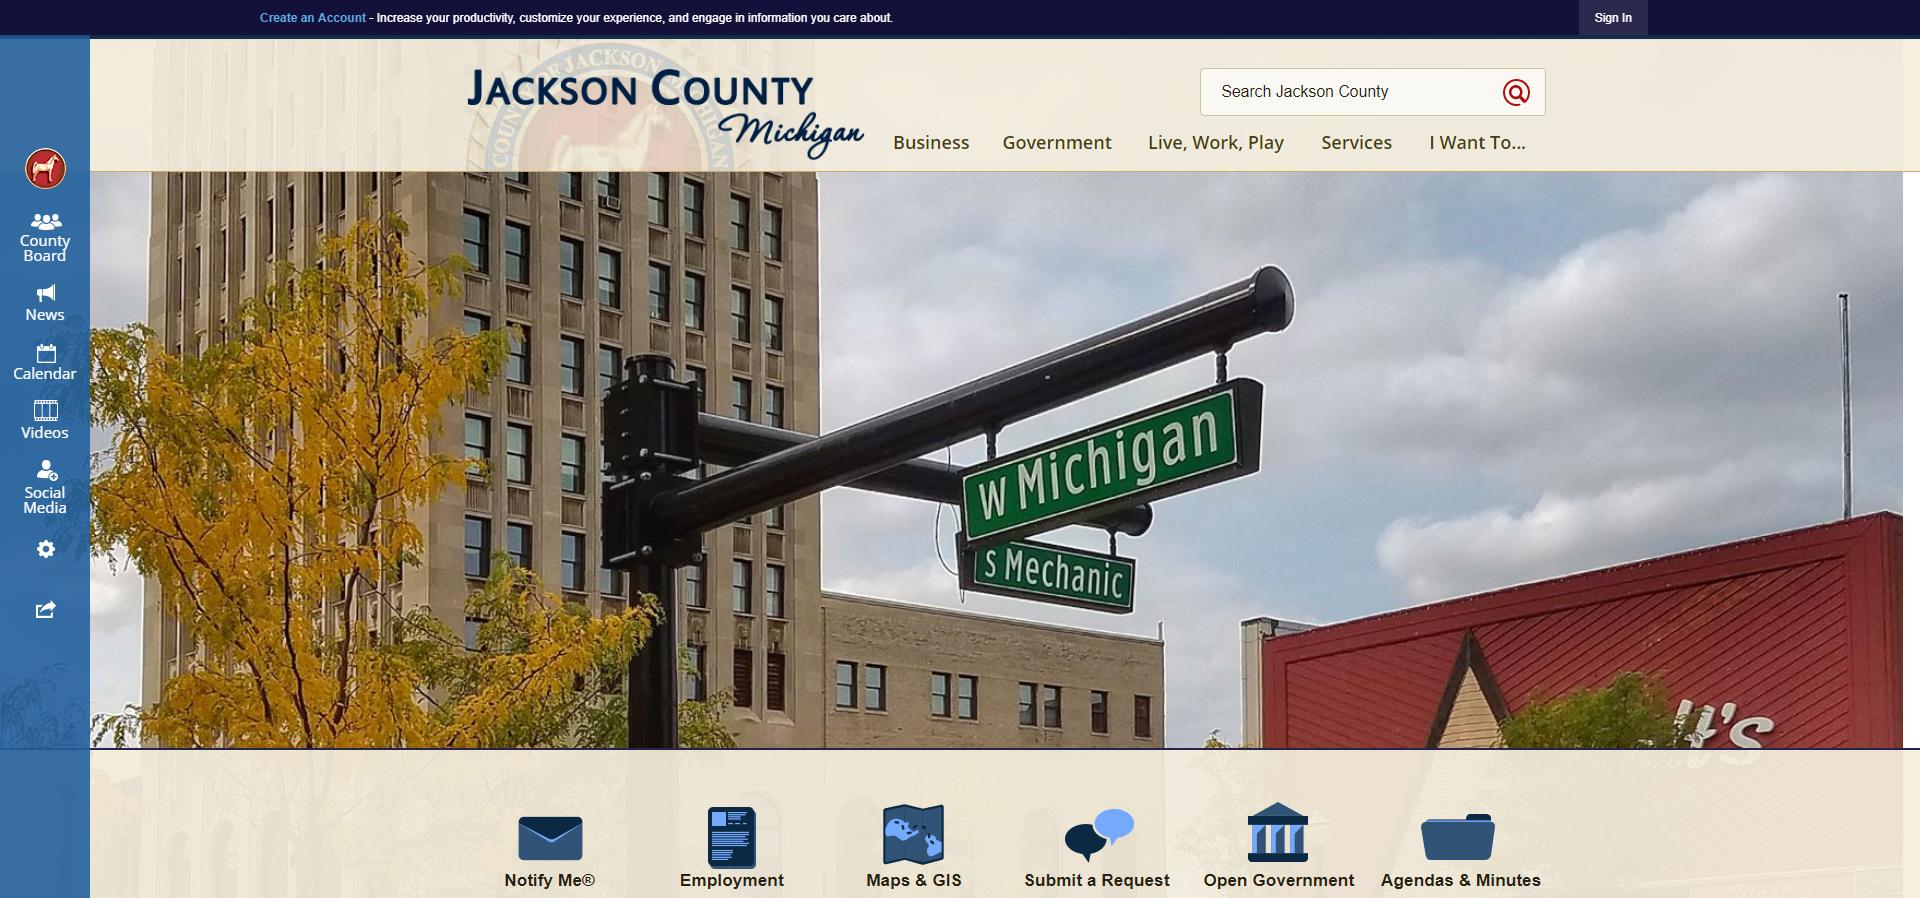 Jackson_County_MI_2018_Digital_Counties_Award_Winner